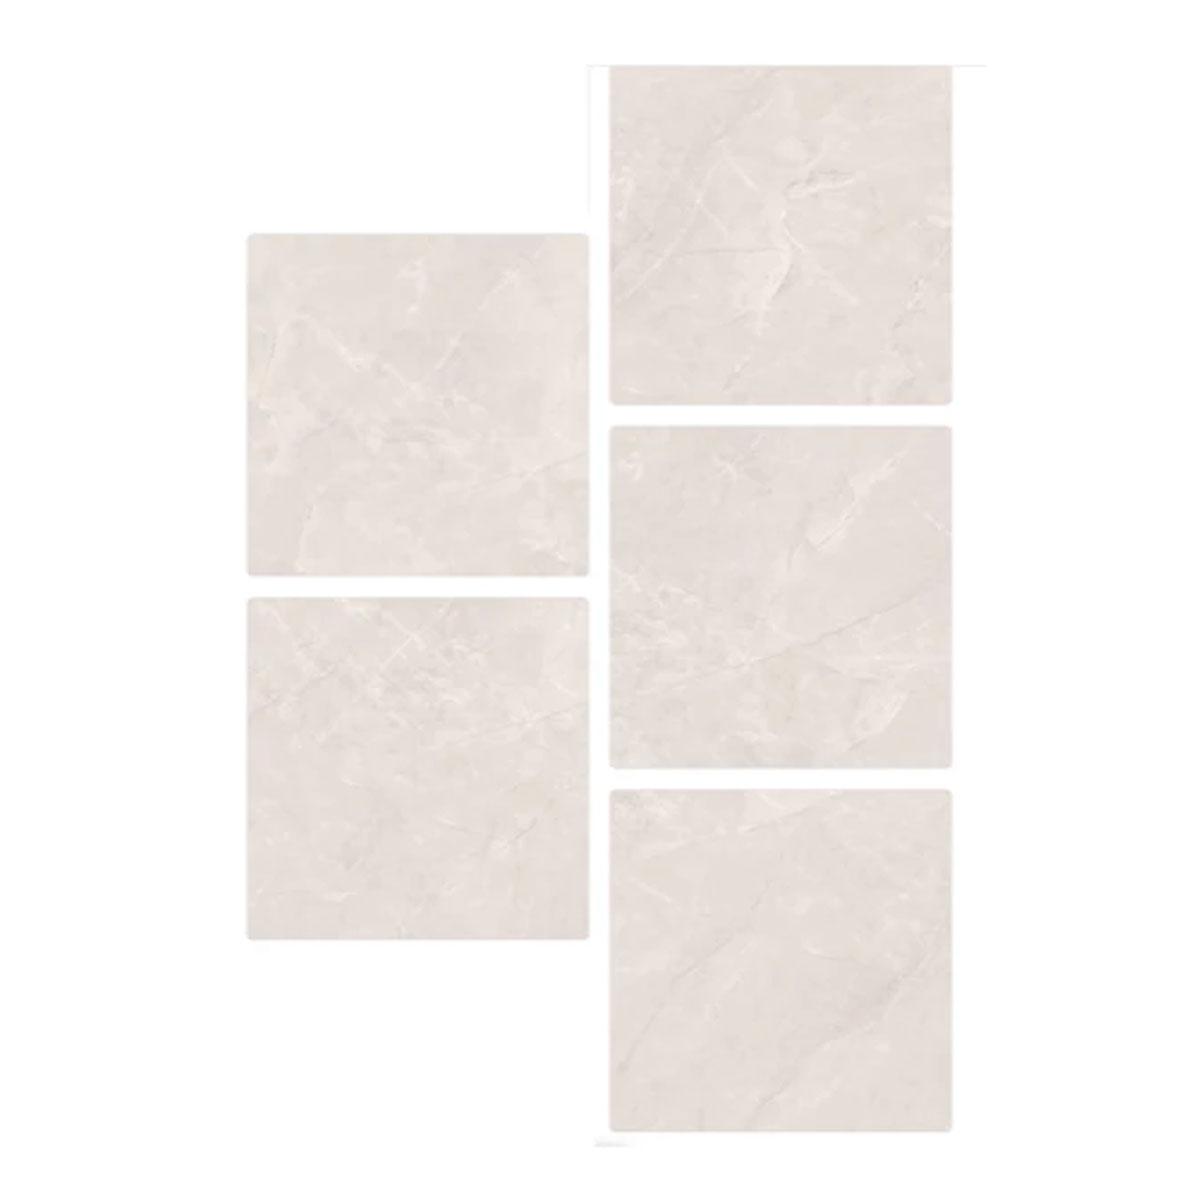 Pavement - Bianco - Marble look Tiles - Stone3 Brisbane